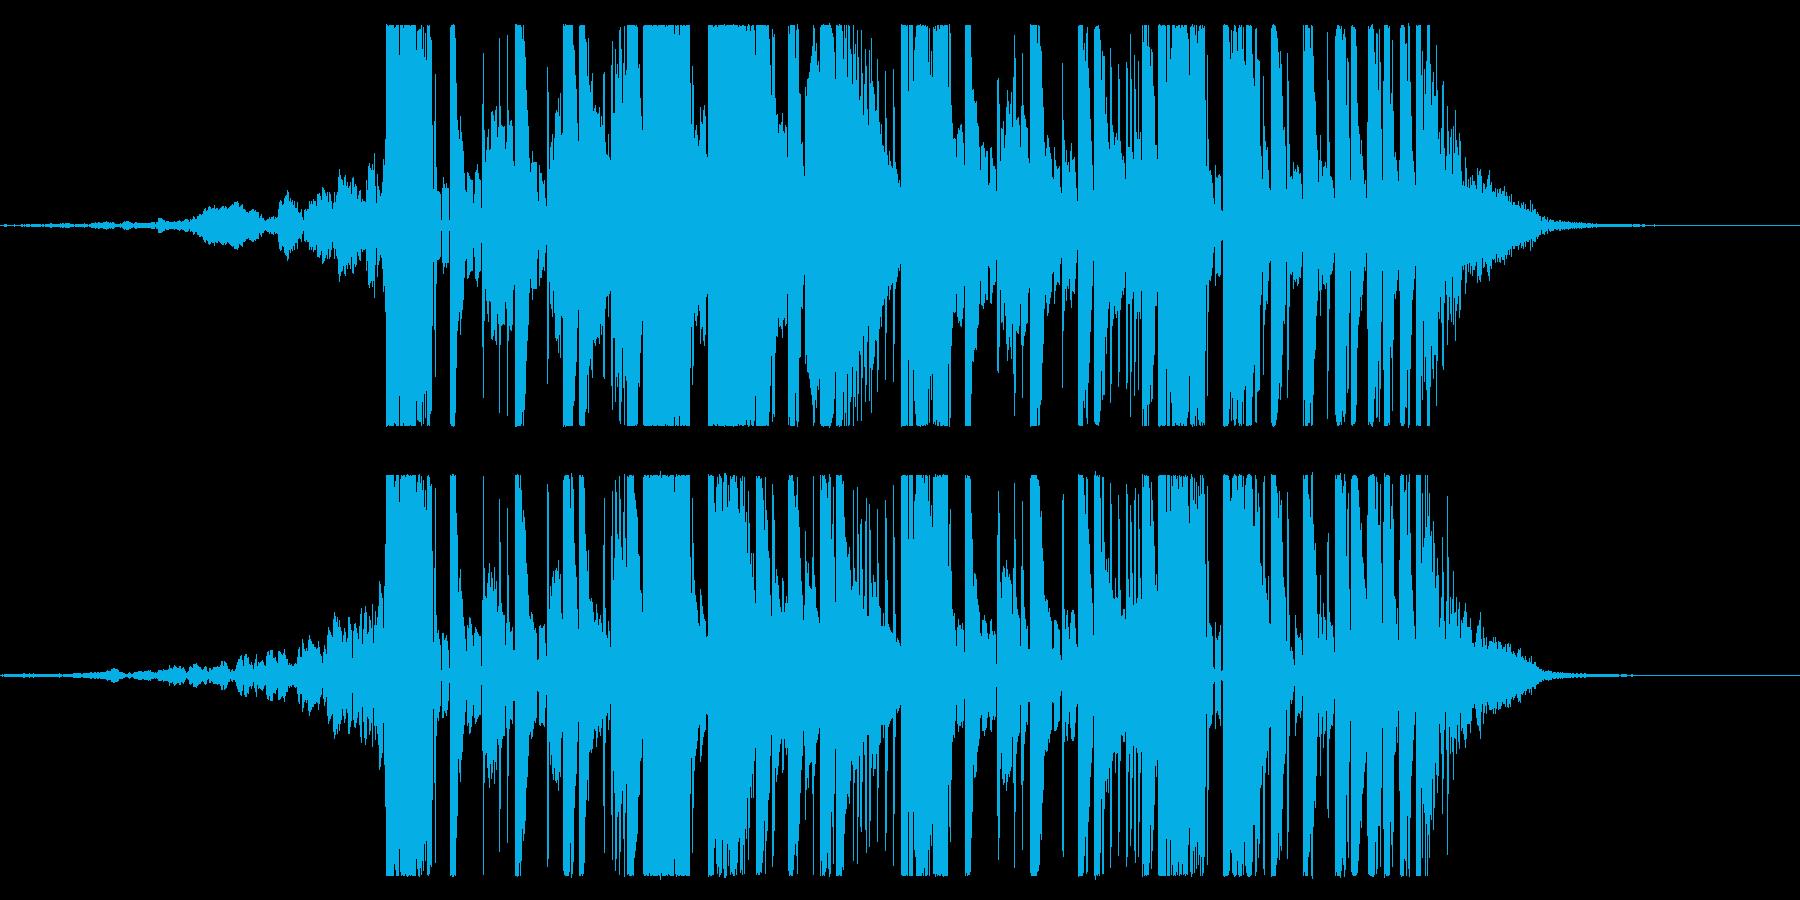 YouTube ダブステップジングル04の再生済みの波形